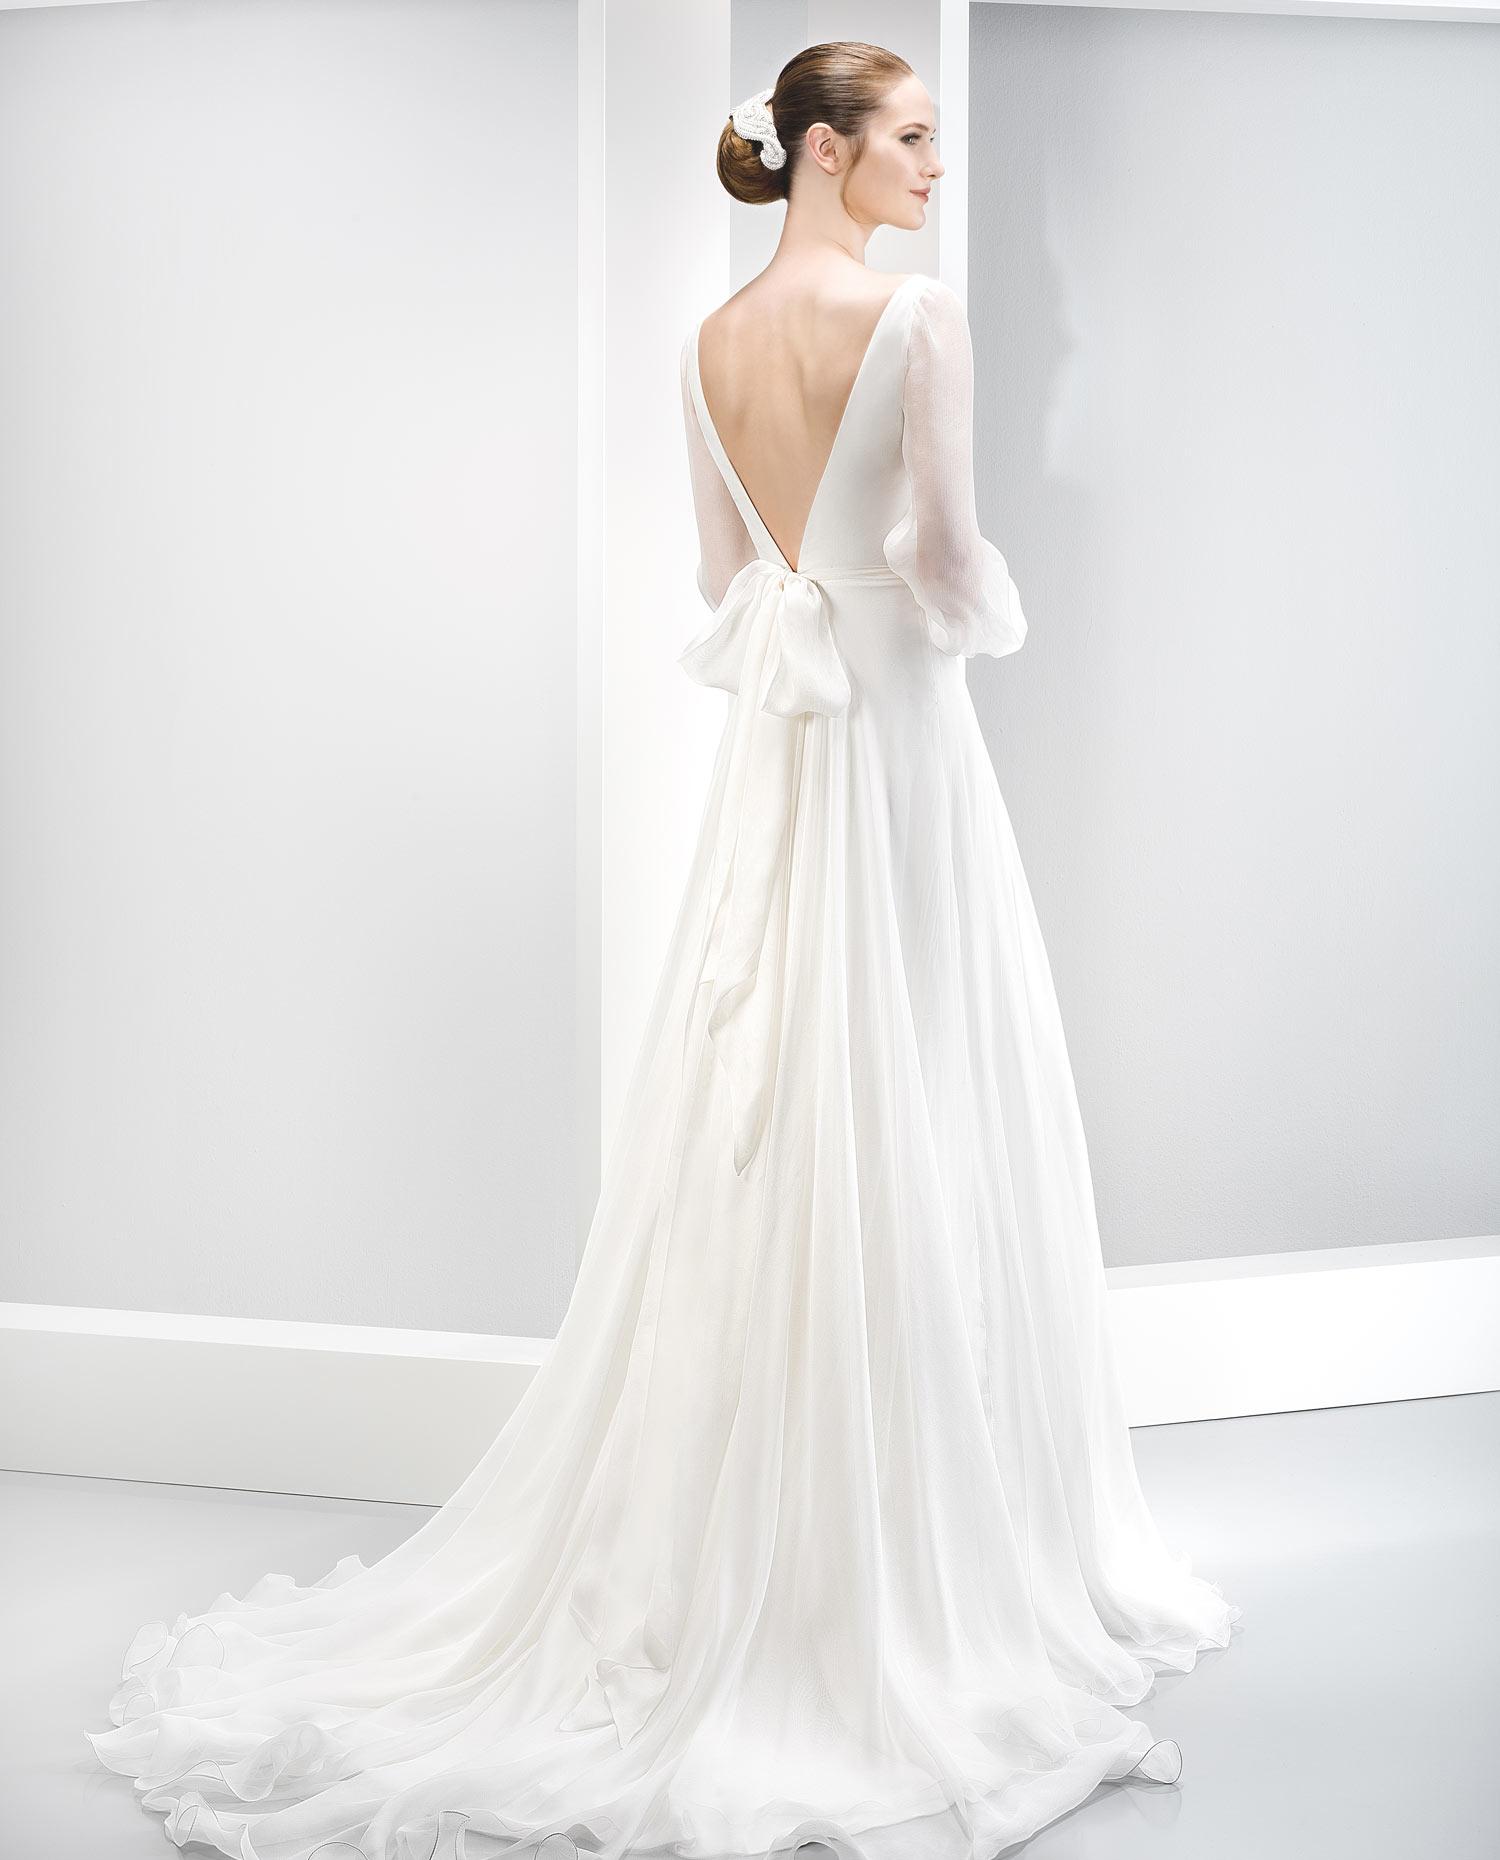 Vestidos de novia de manga larga Primavera Verano 2019 - Tendenzias.com f296b04b6f69